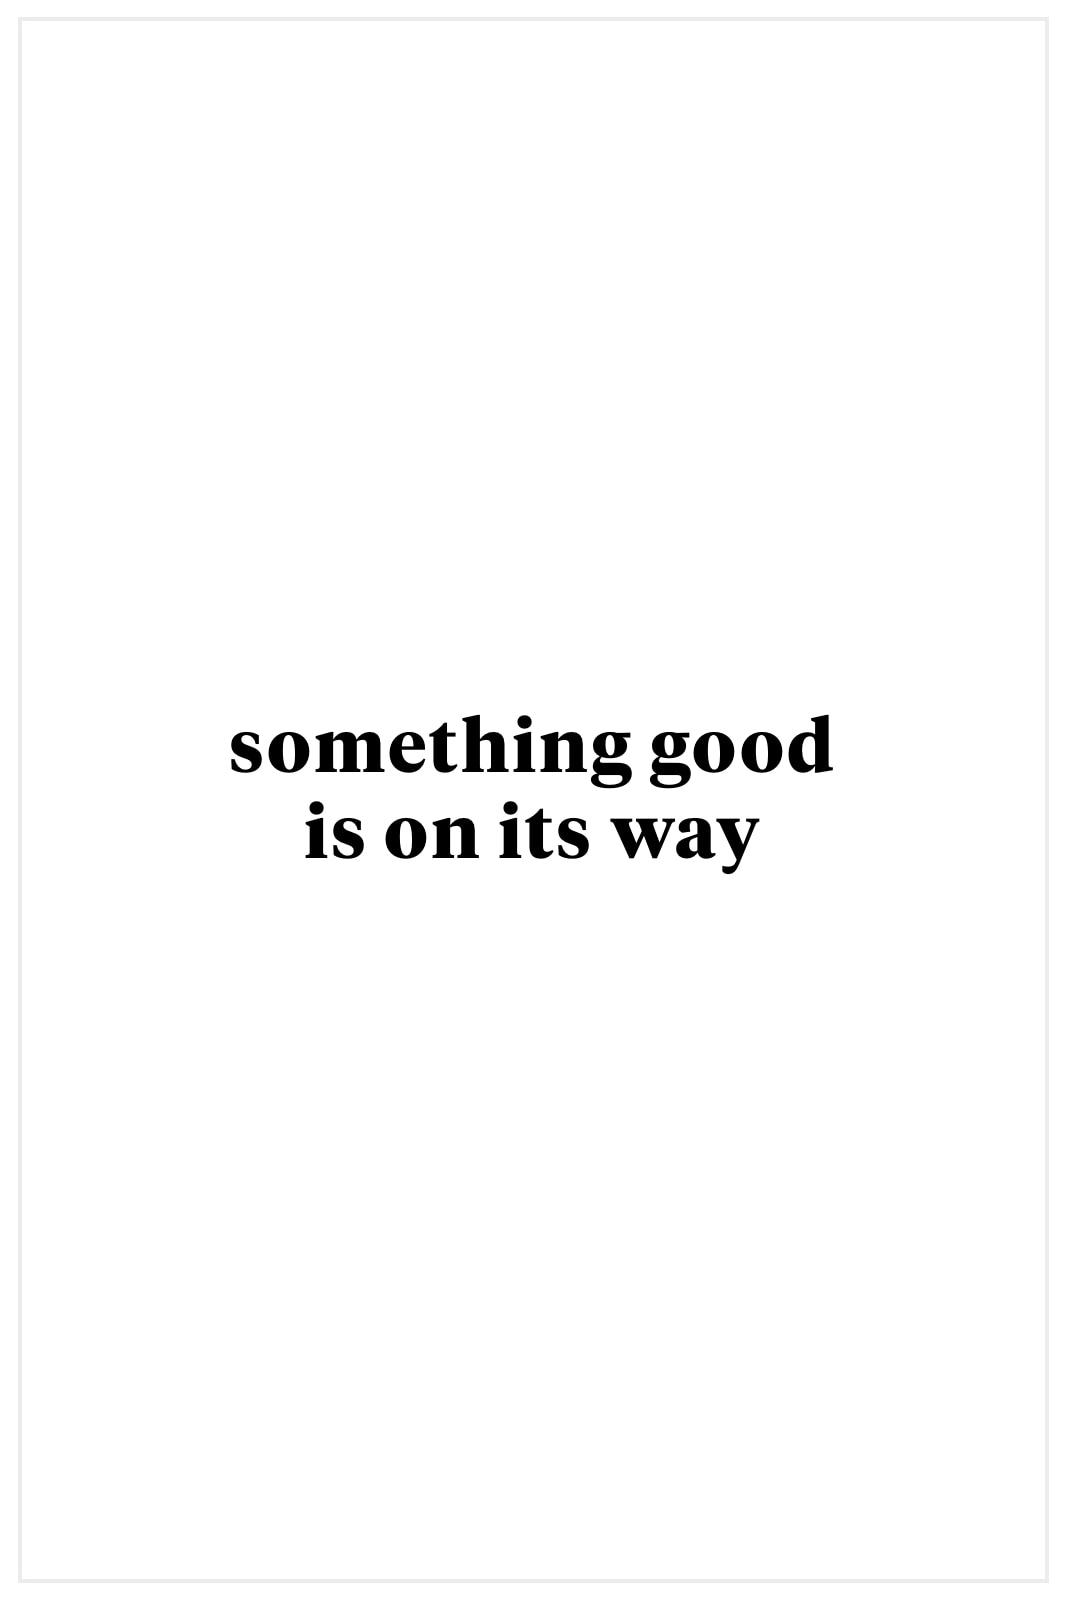 Peyton jensen Shaine Smocked Skirt